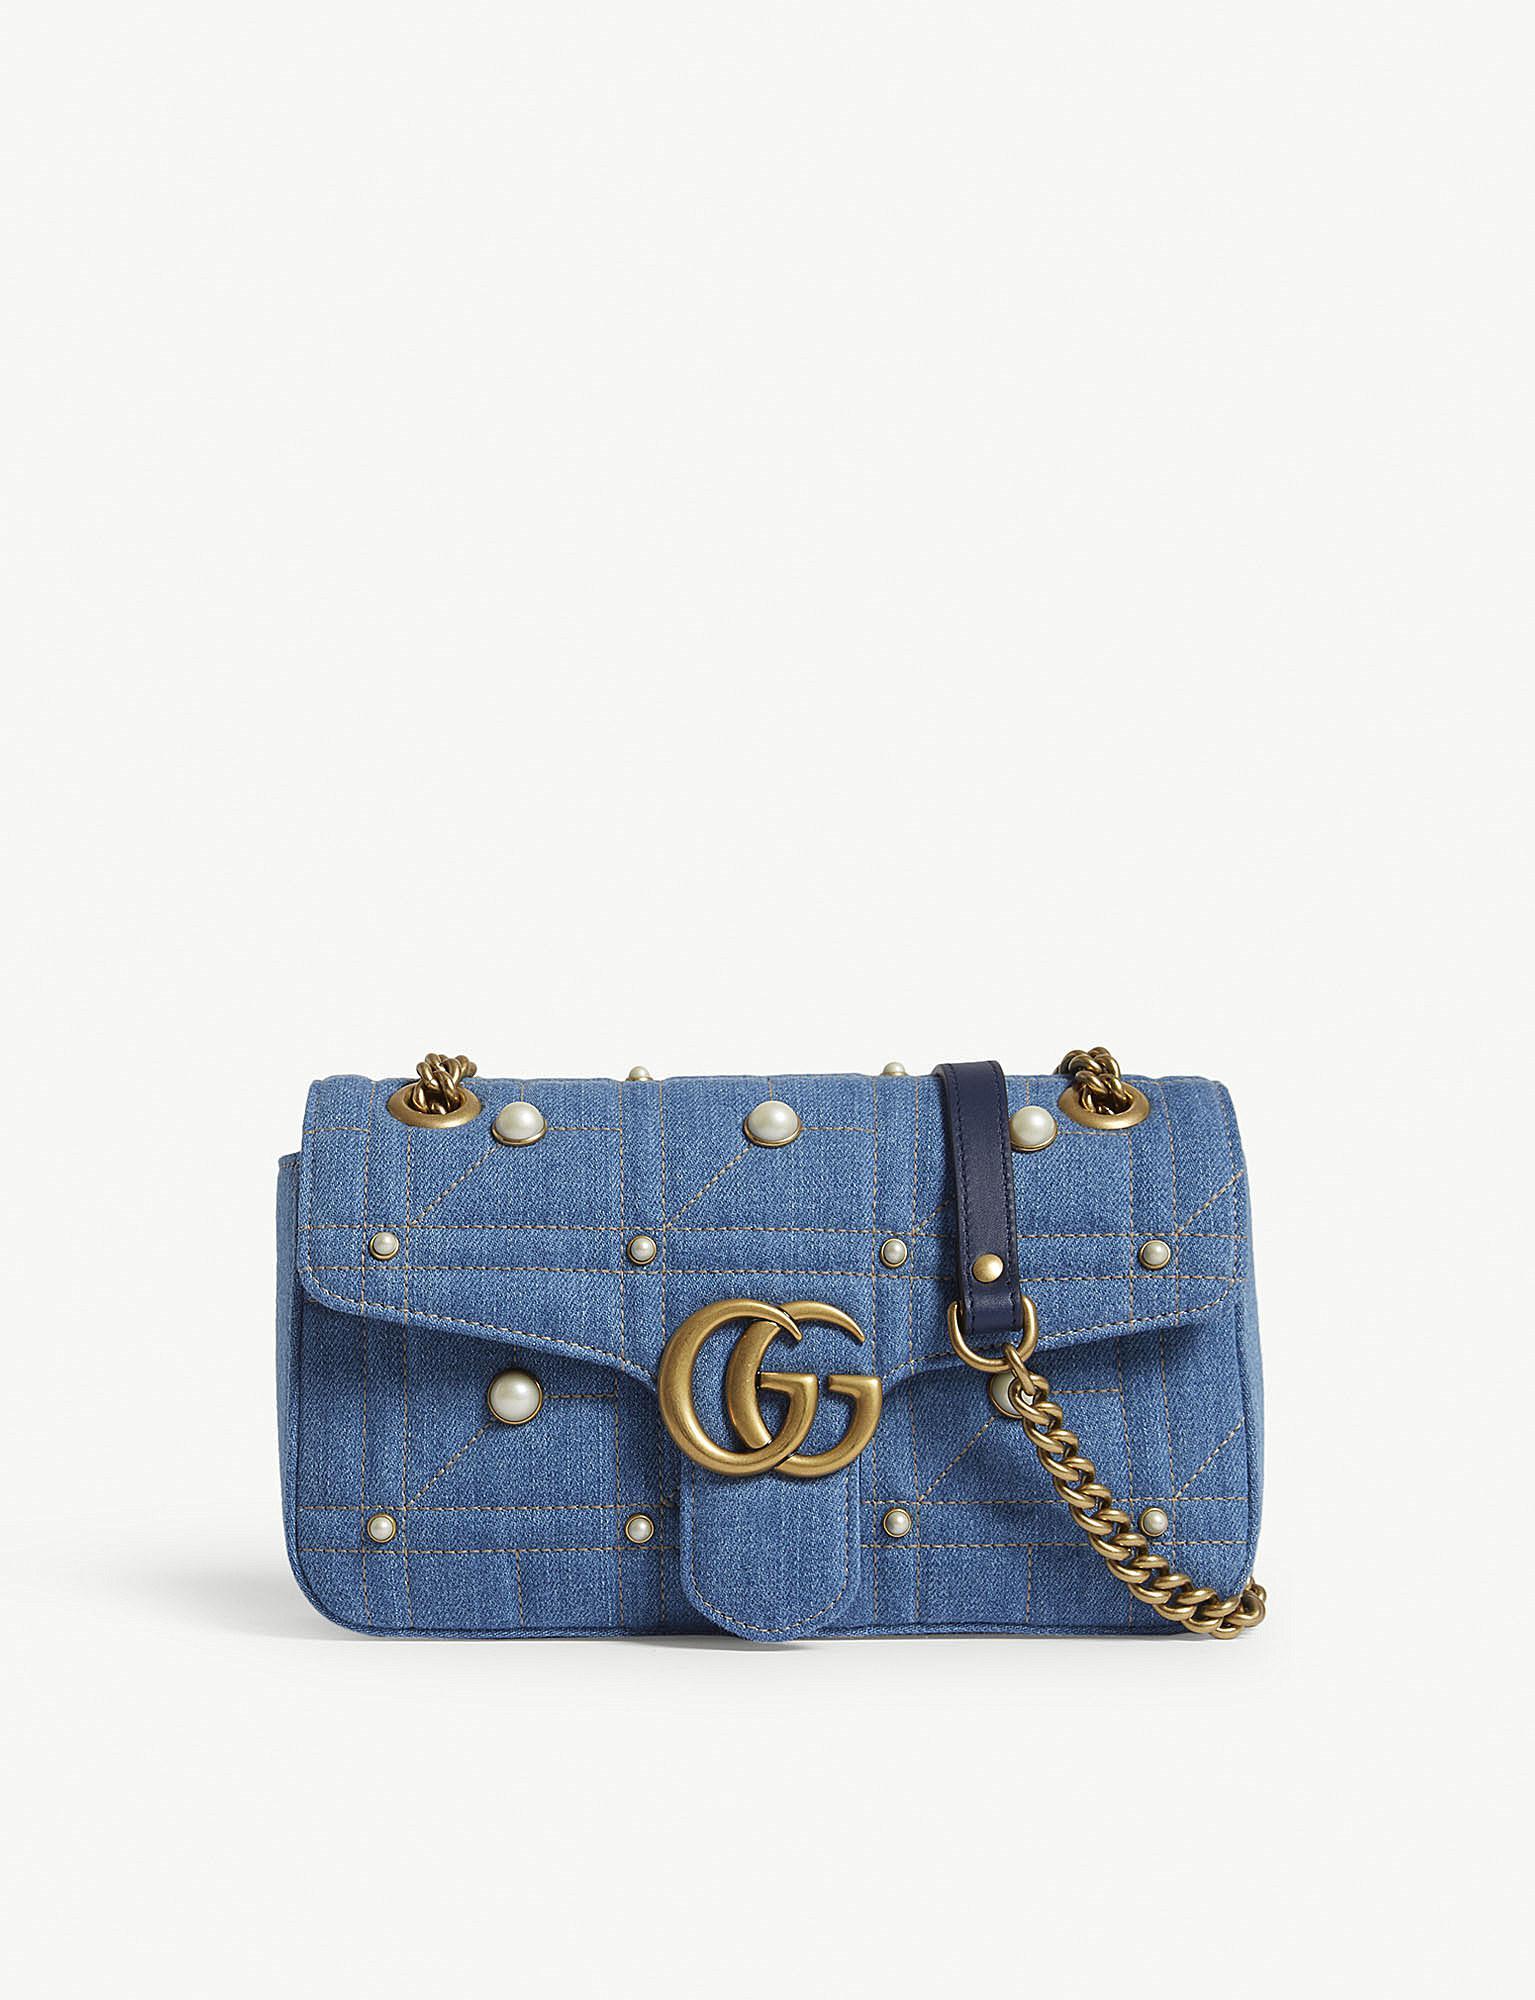 eb490c255c4e Gucci Marmont Matelassé Denim Cross-body Bag in Blue - Lyst